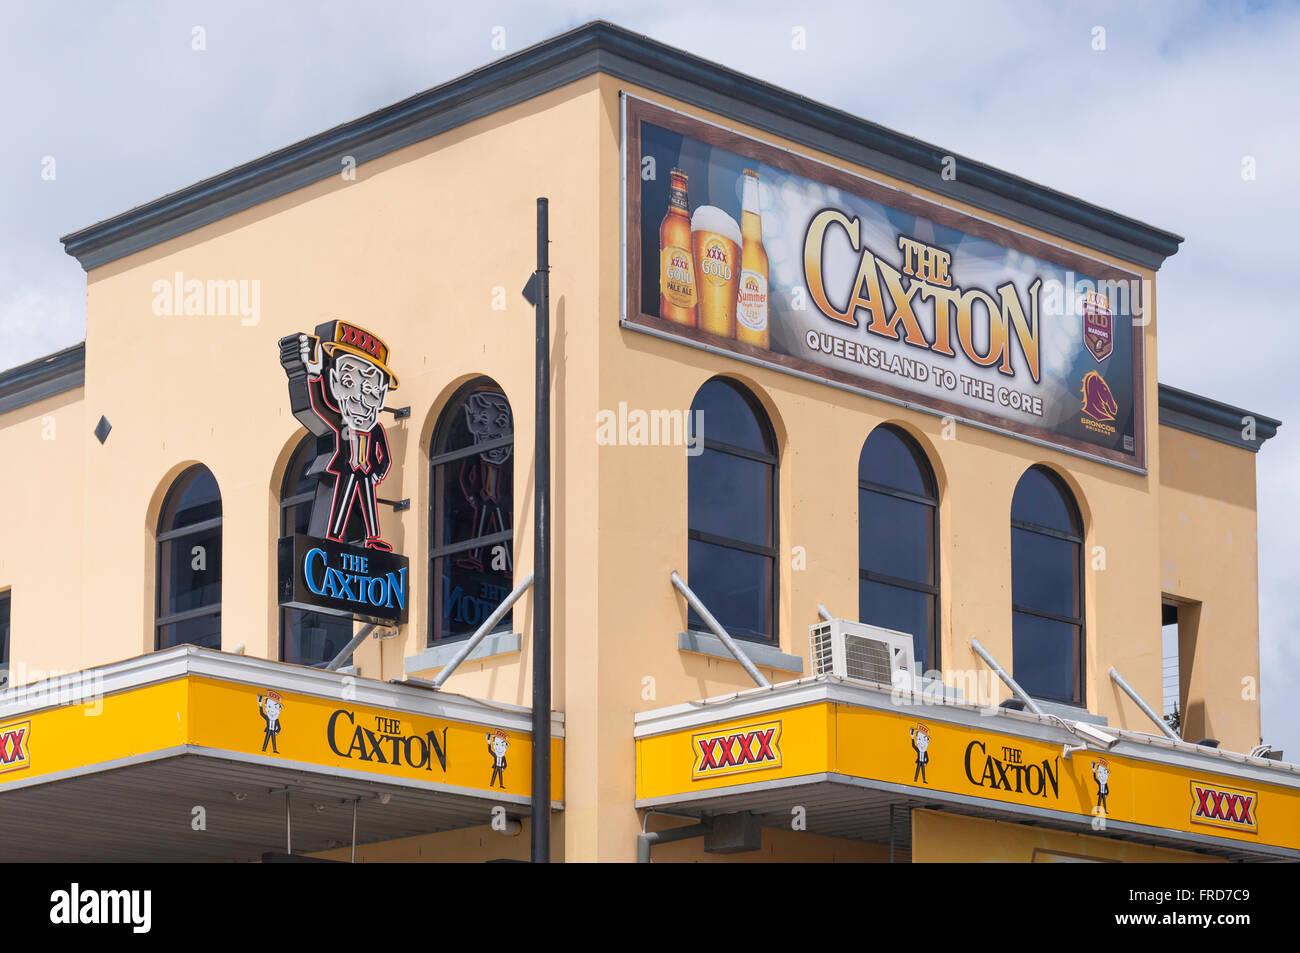 Exterior of the historic Caxton Hotel, Caxton Street, Paddington, Brisbane, Queensland, Australia - Stock Image